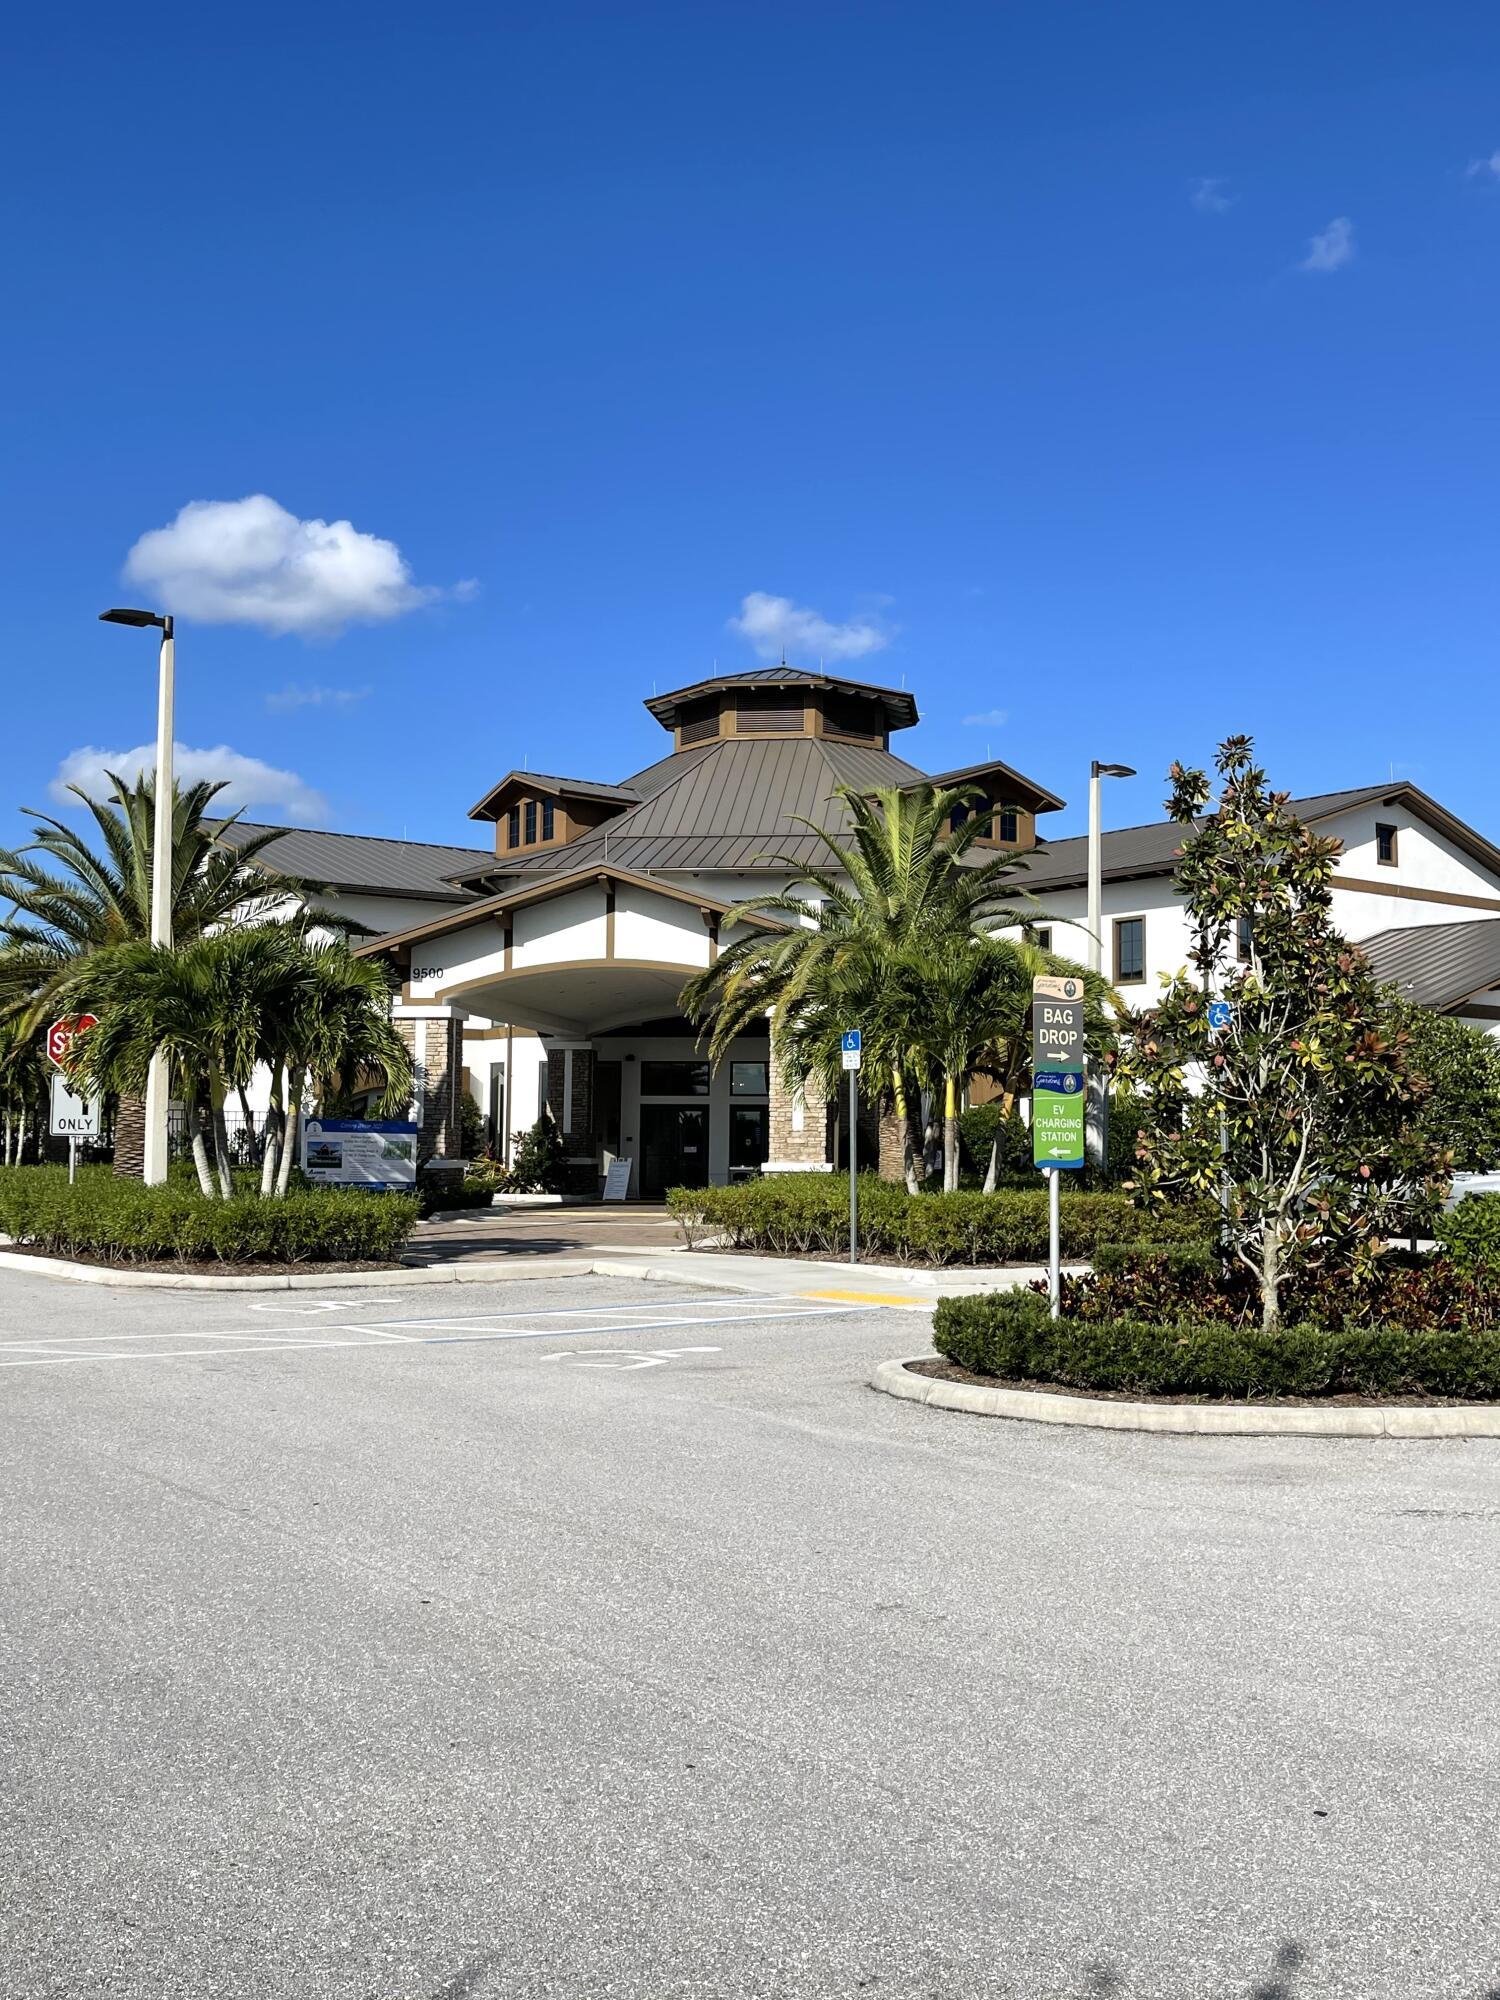 Sand Hill Crane Golf Clubhouse